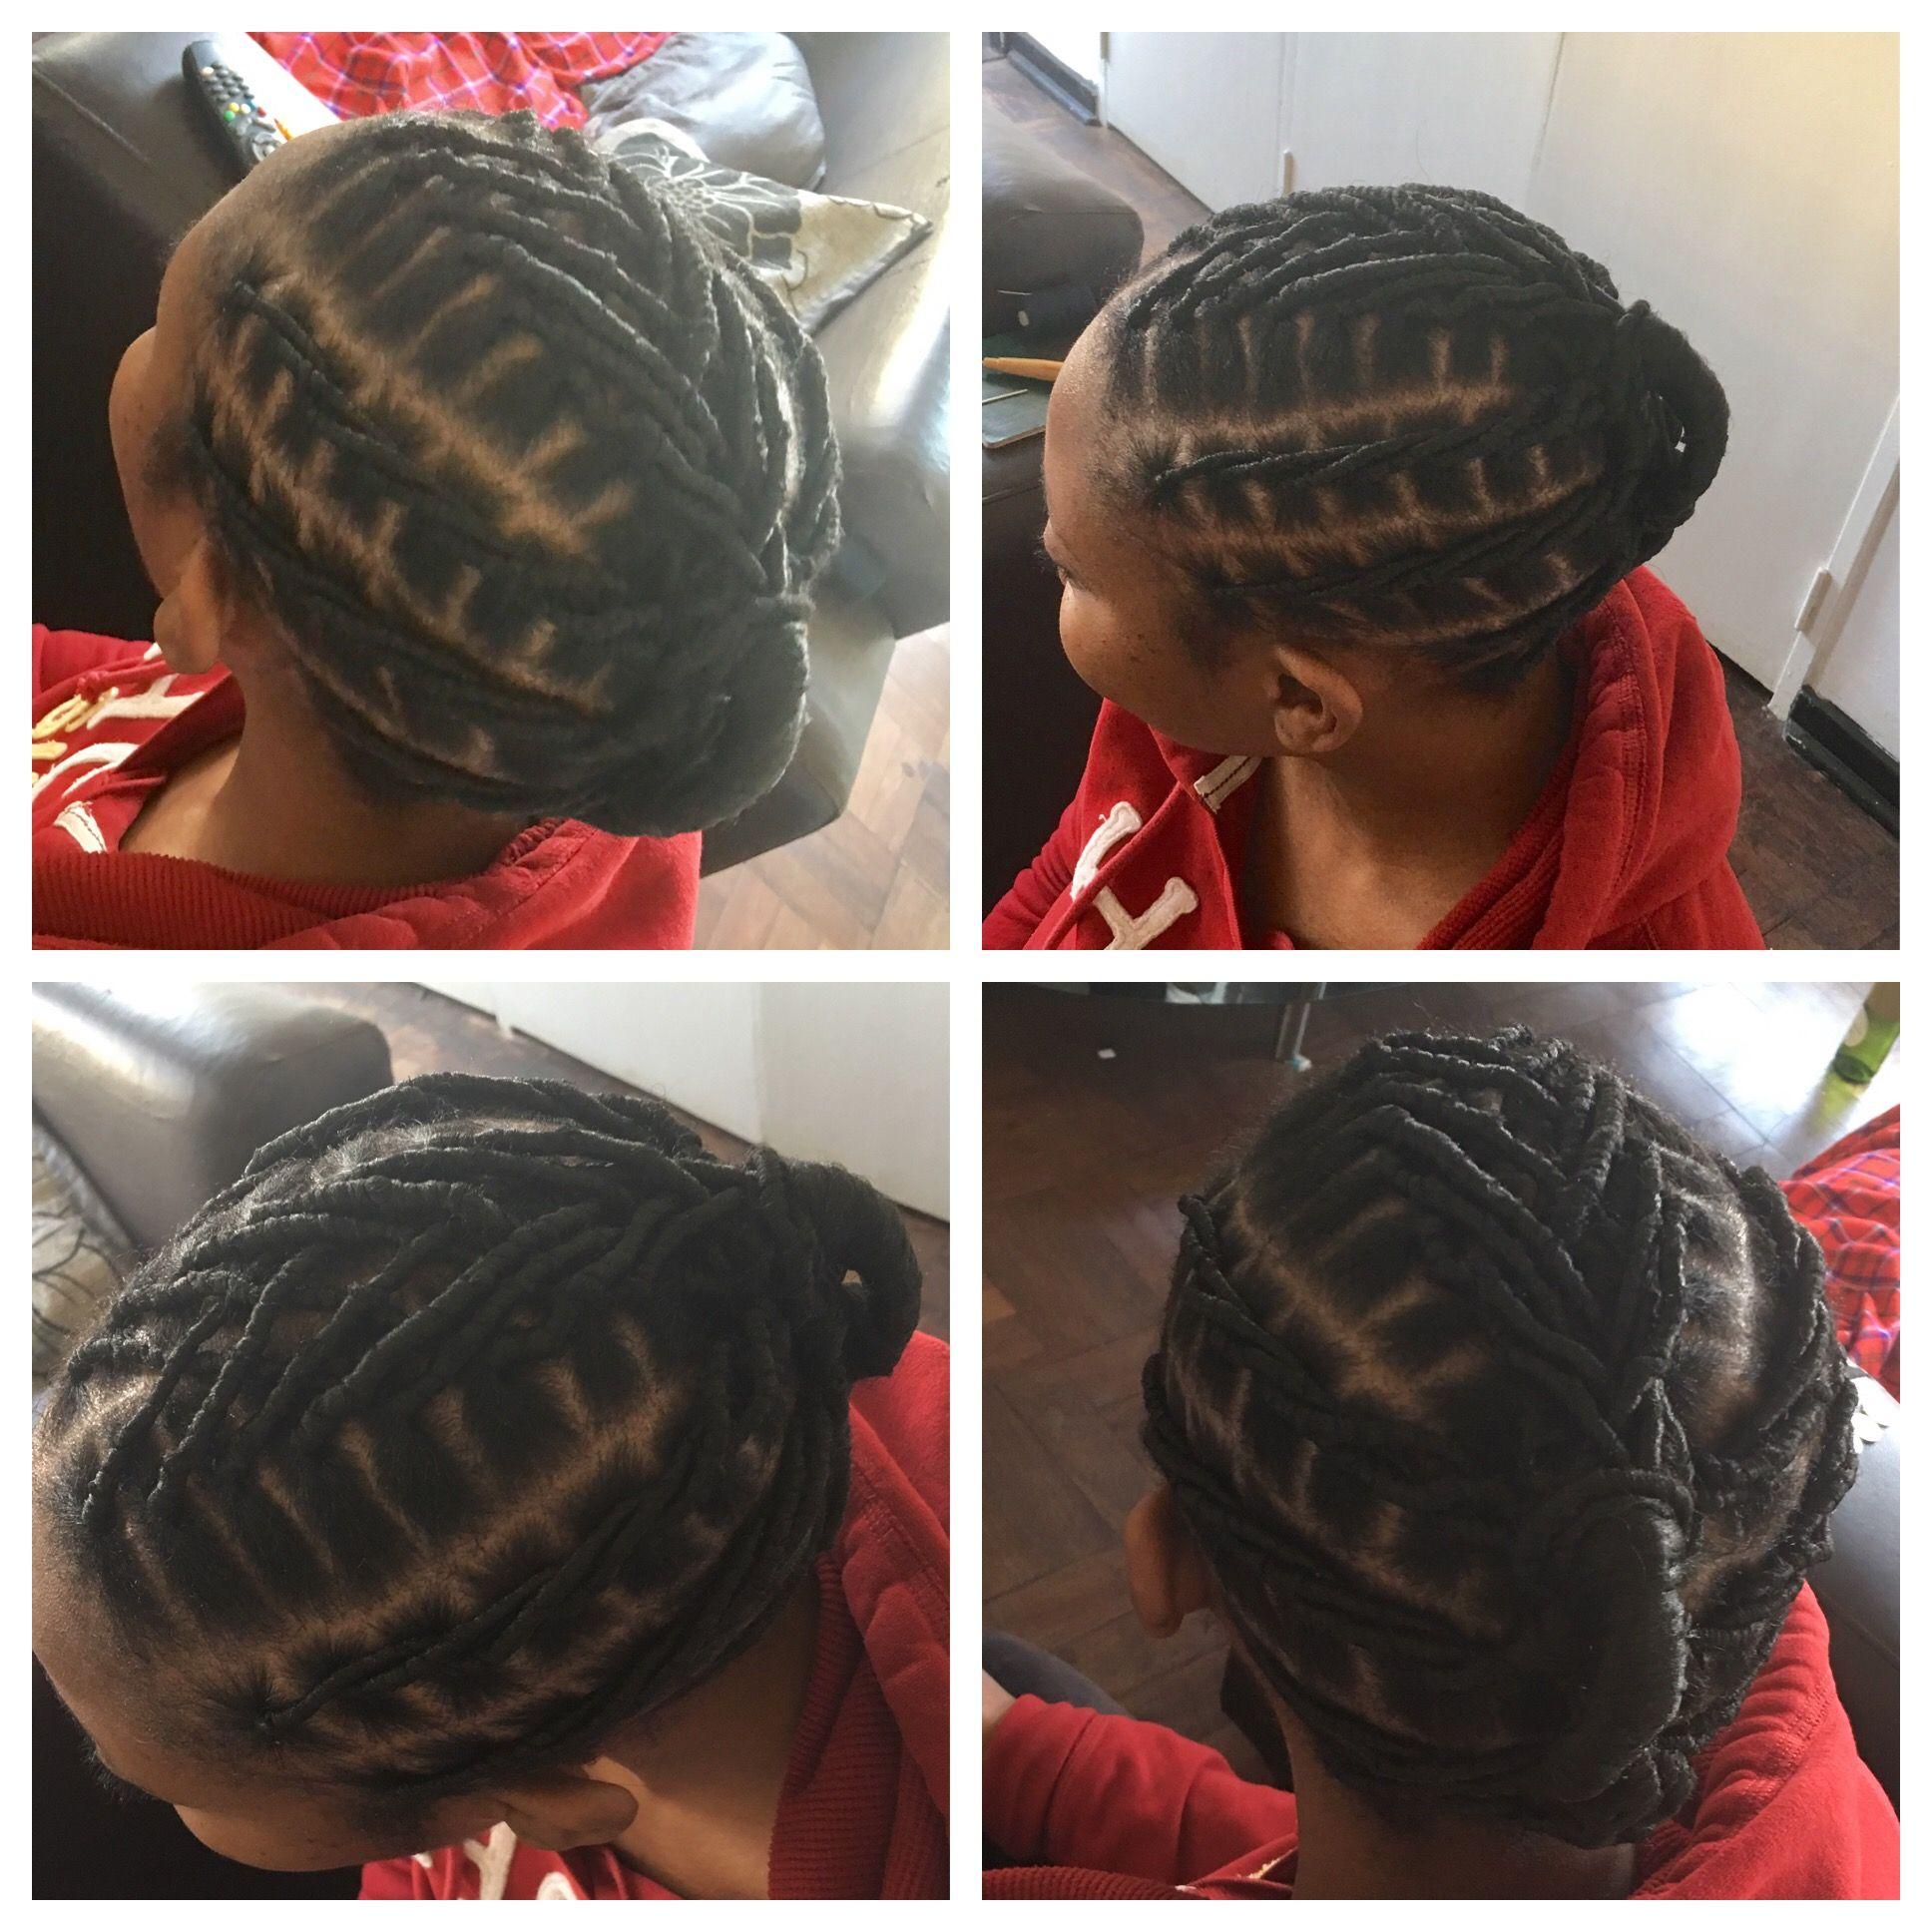 Mabhanzi Brazilian Wool African Threading Style Natural Hair Styles For Black Women Brazilian Wool Hairstyles Natural Hair Styles